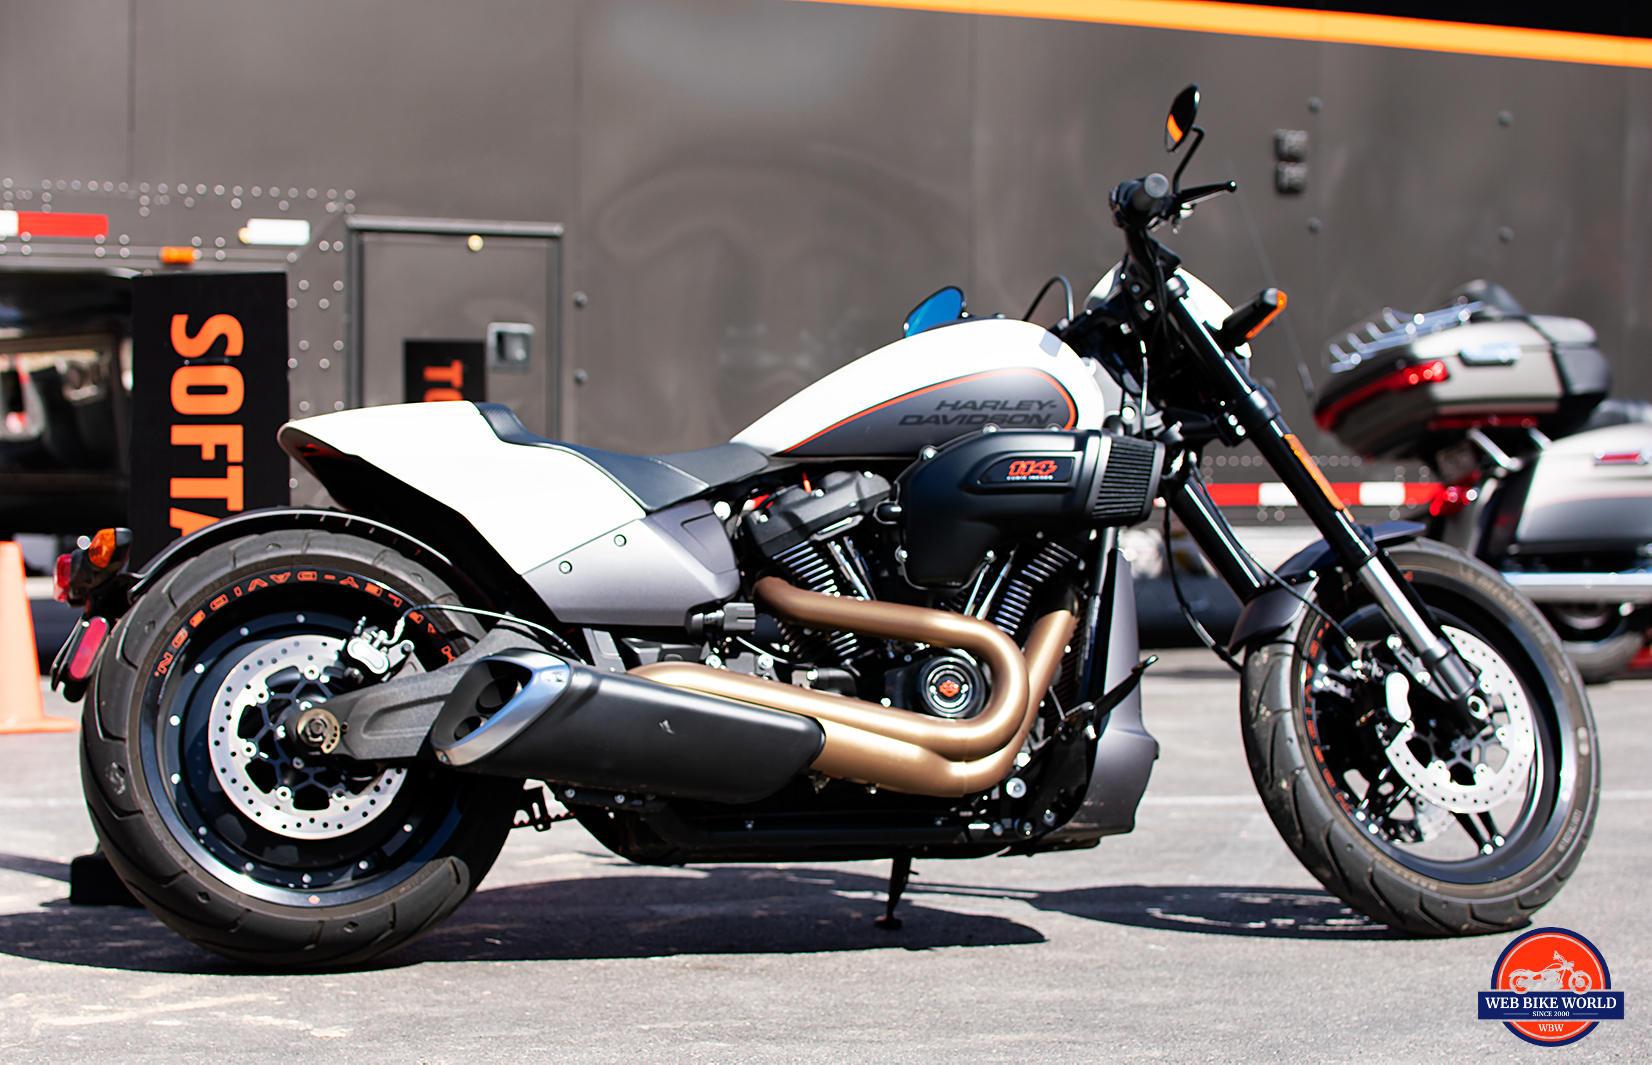 2019 Harley Davidson Fxdr 114: 2019 Harley Davidson FXDR Test Ride